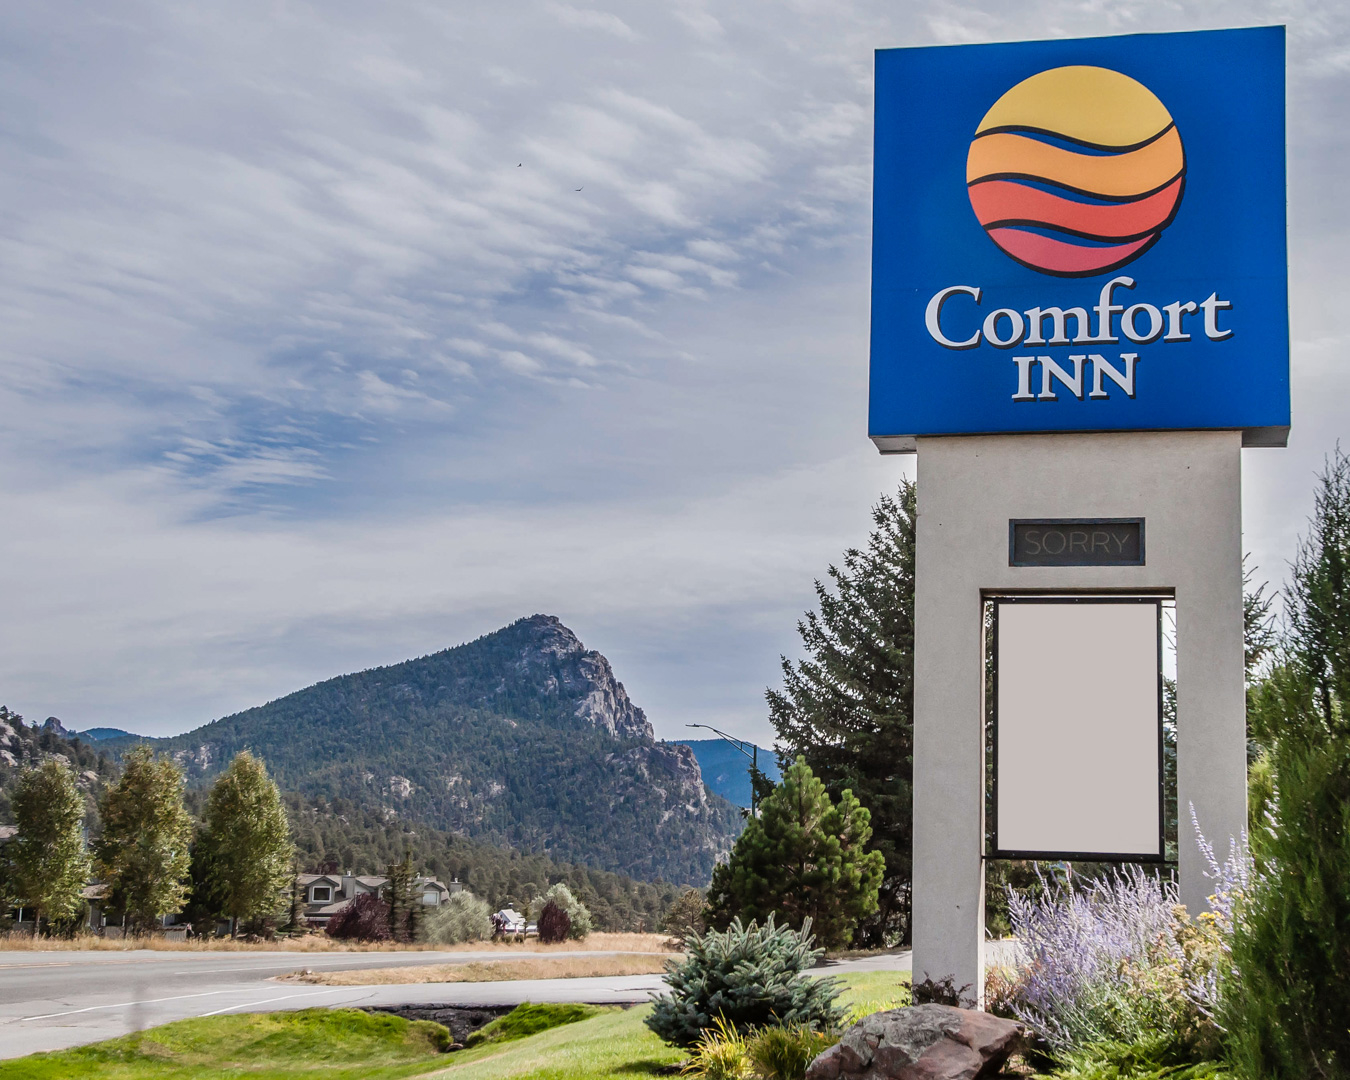 Comfort Inn, Estes Park CO